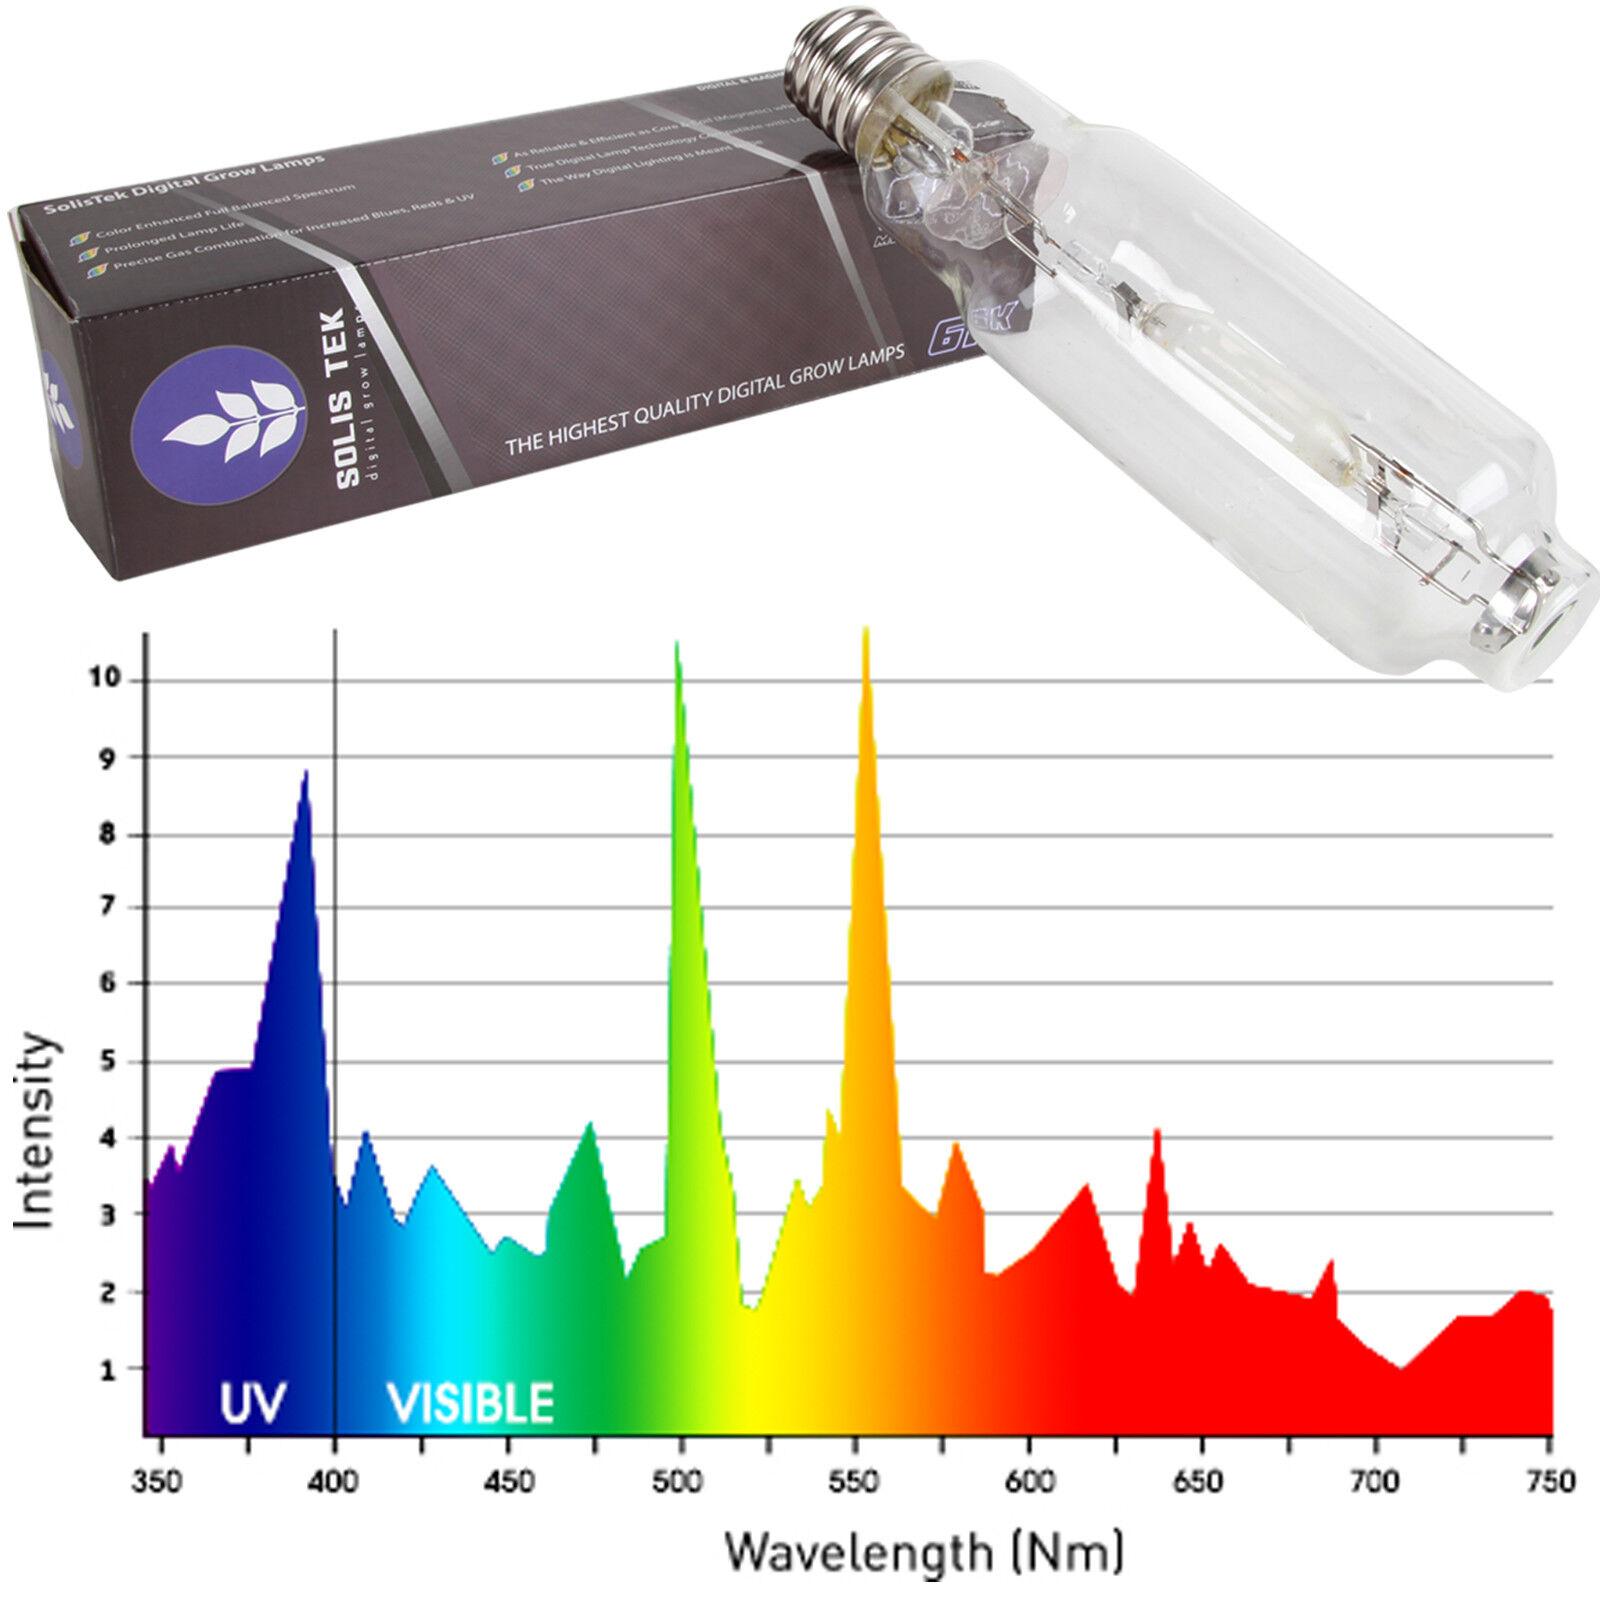 Solistek 600 W Mh se 6K luz lámpara hidropónica de un solo extremo Veg Cultivar Lámpara